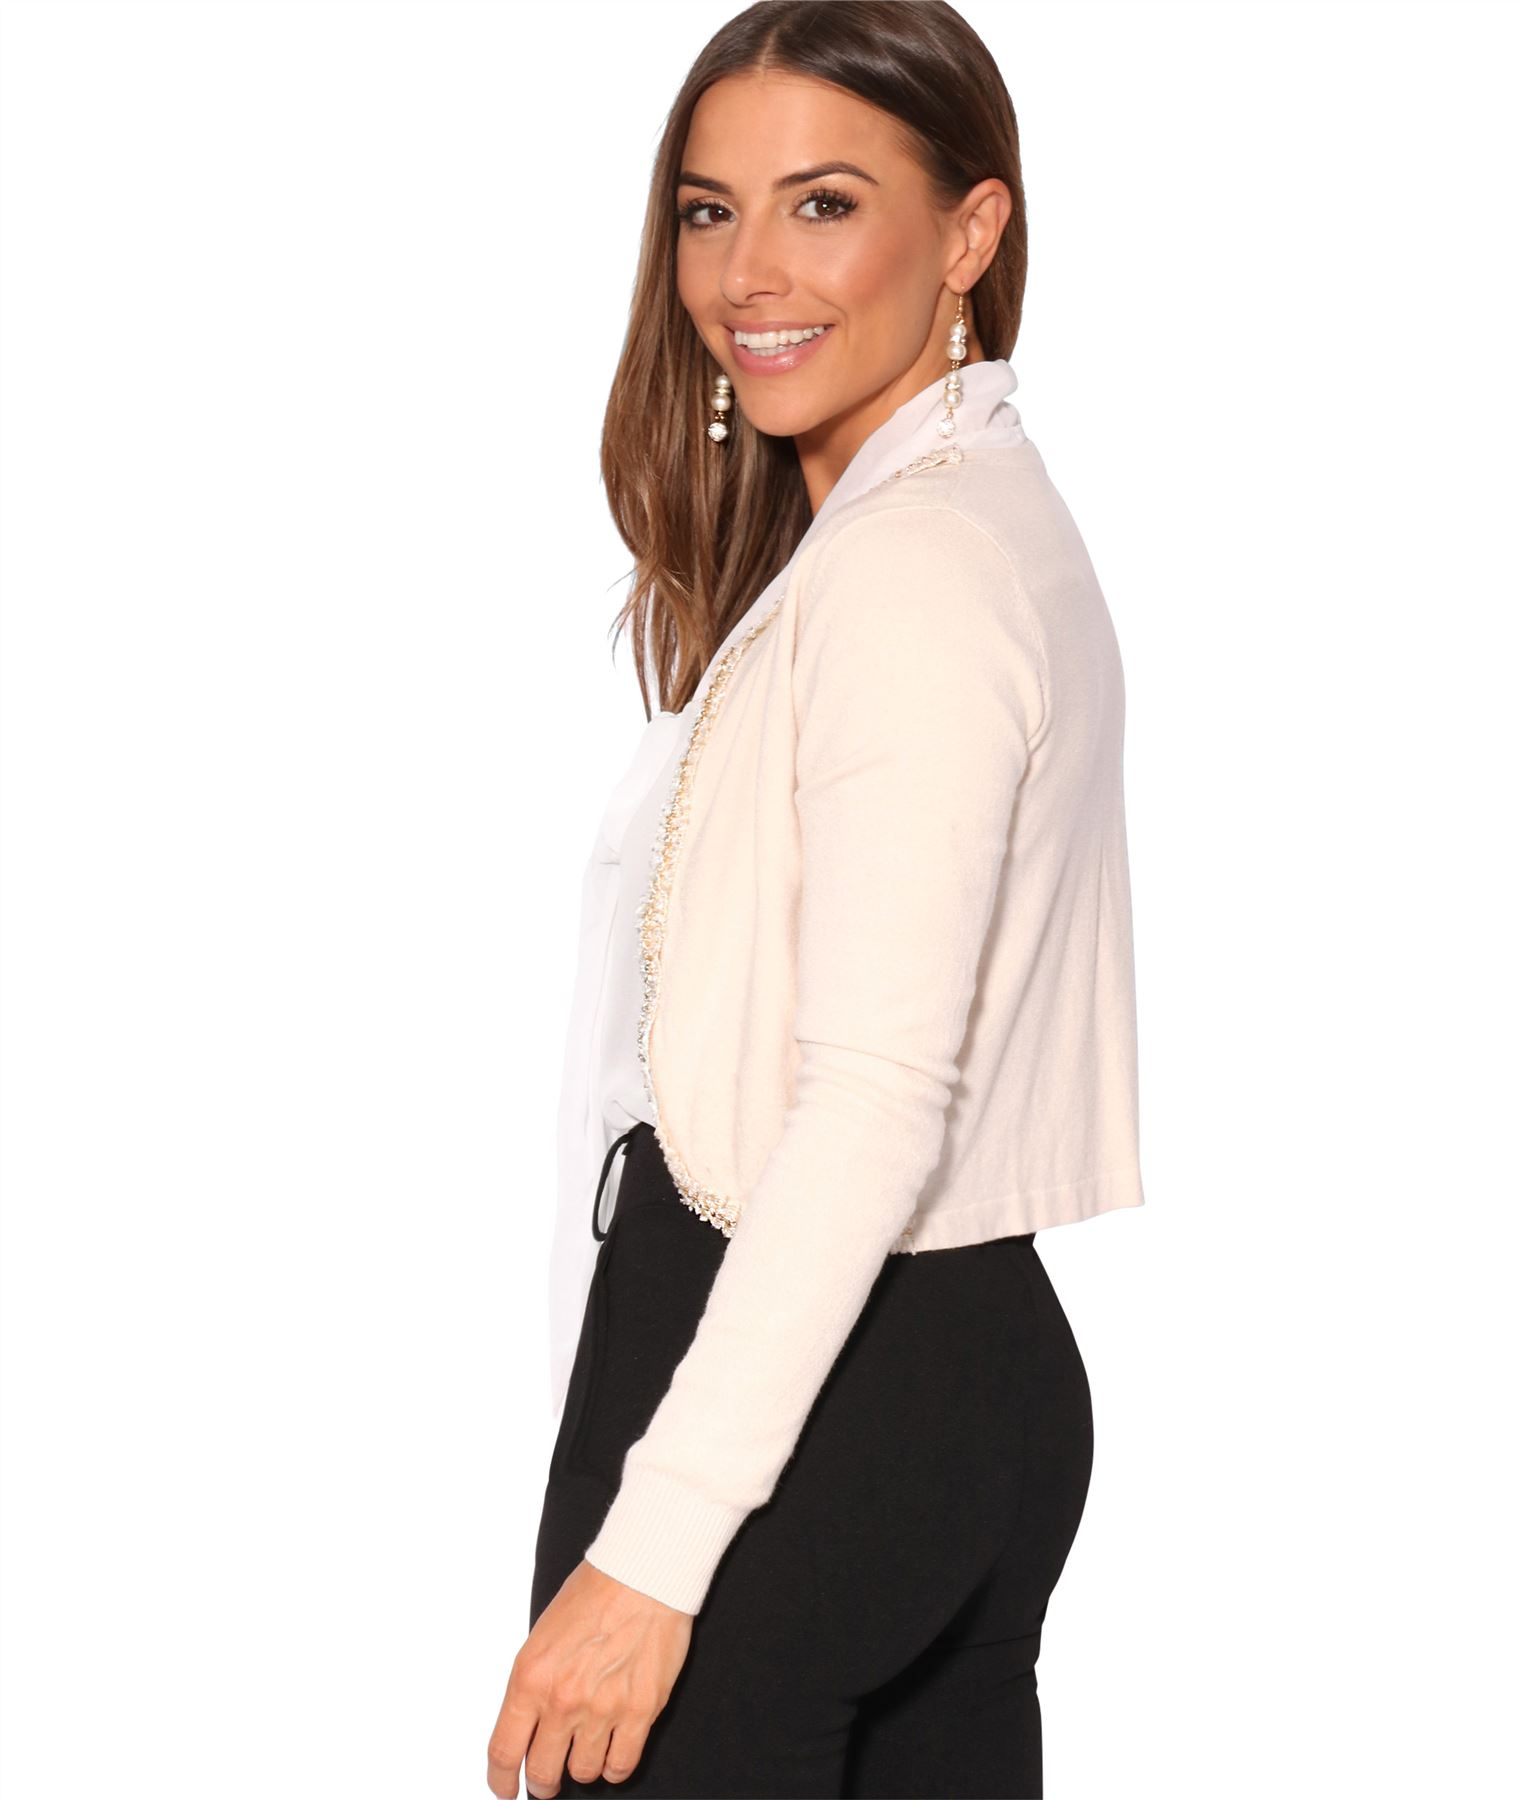 Womens Ladies Bolero Shrug Silky Soft Cardigan Long Sleeve Knit Short Top Work